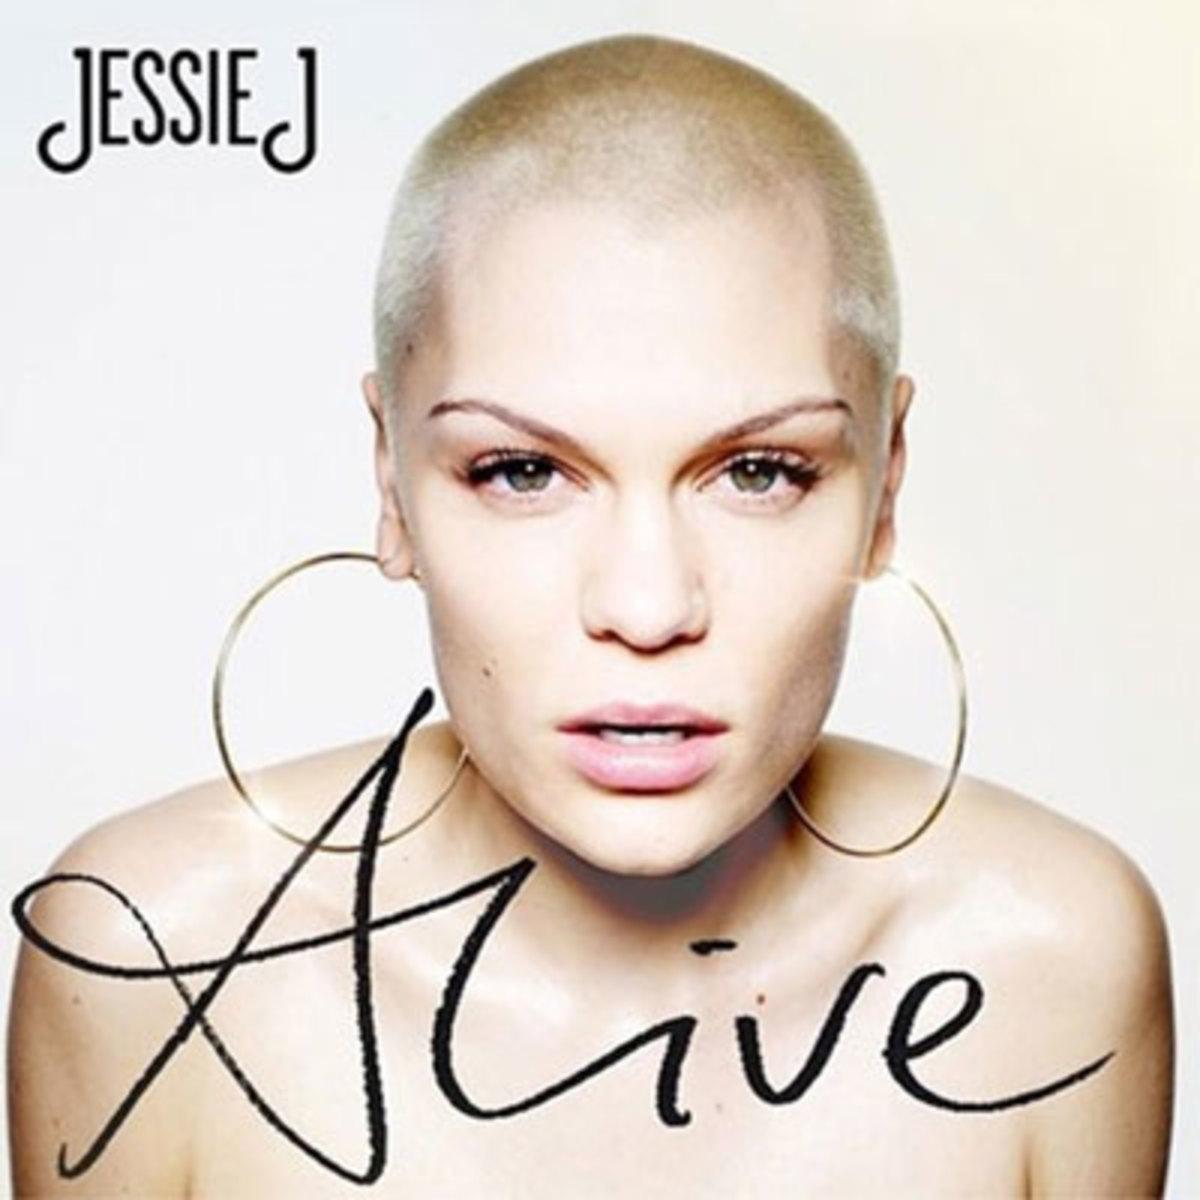 jessiej-alive.jpg